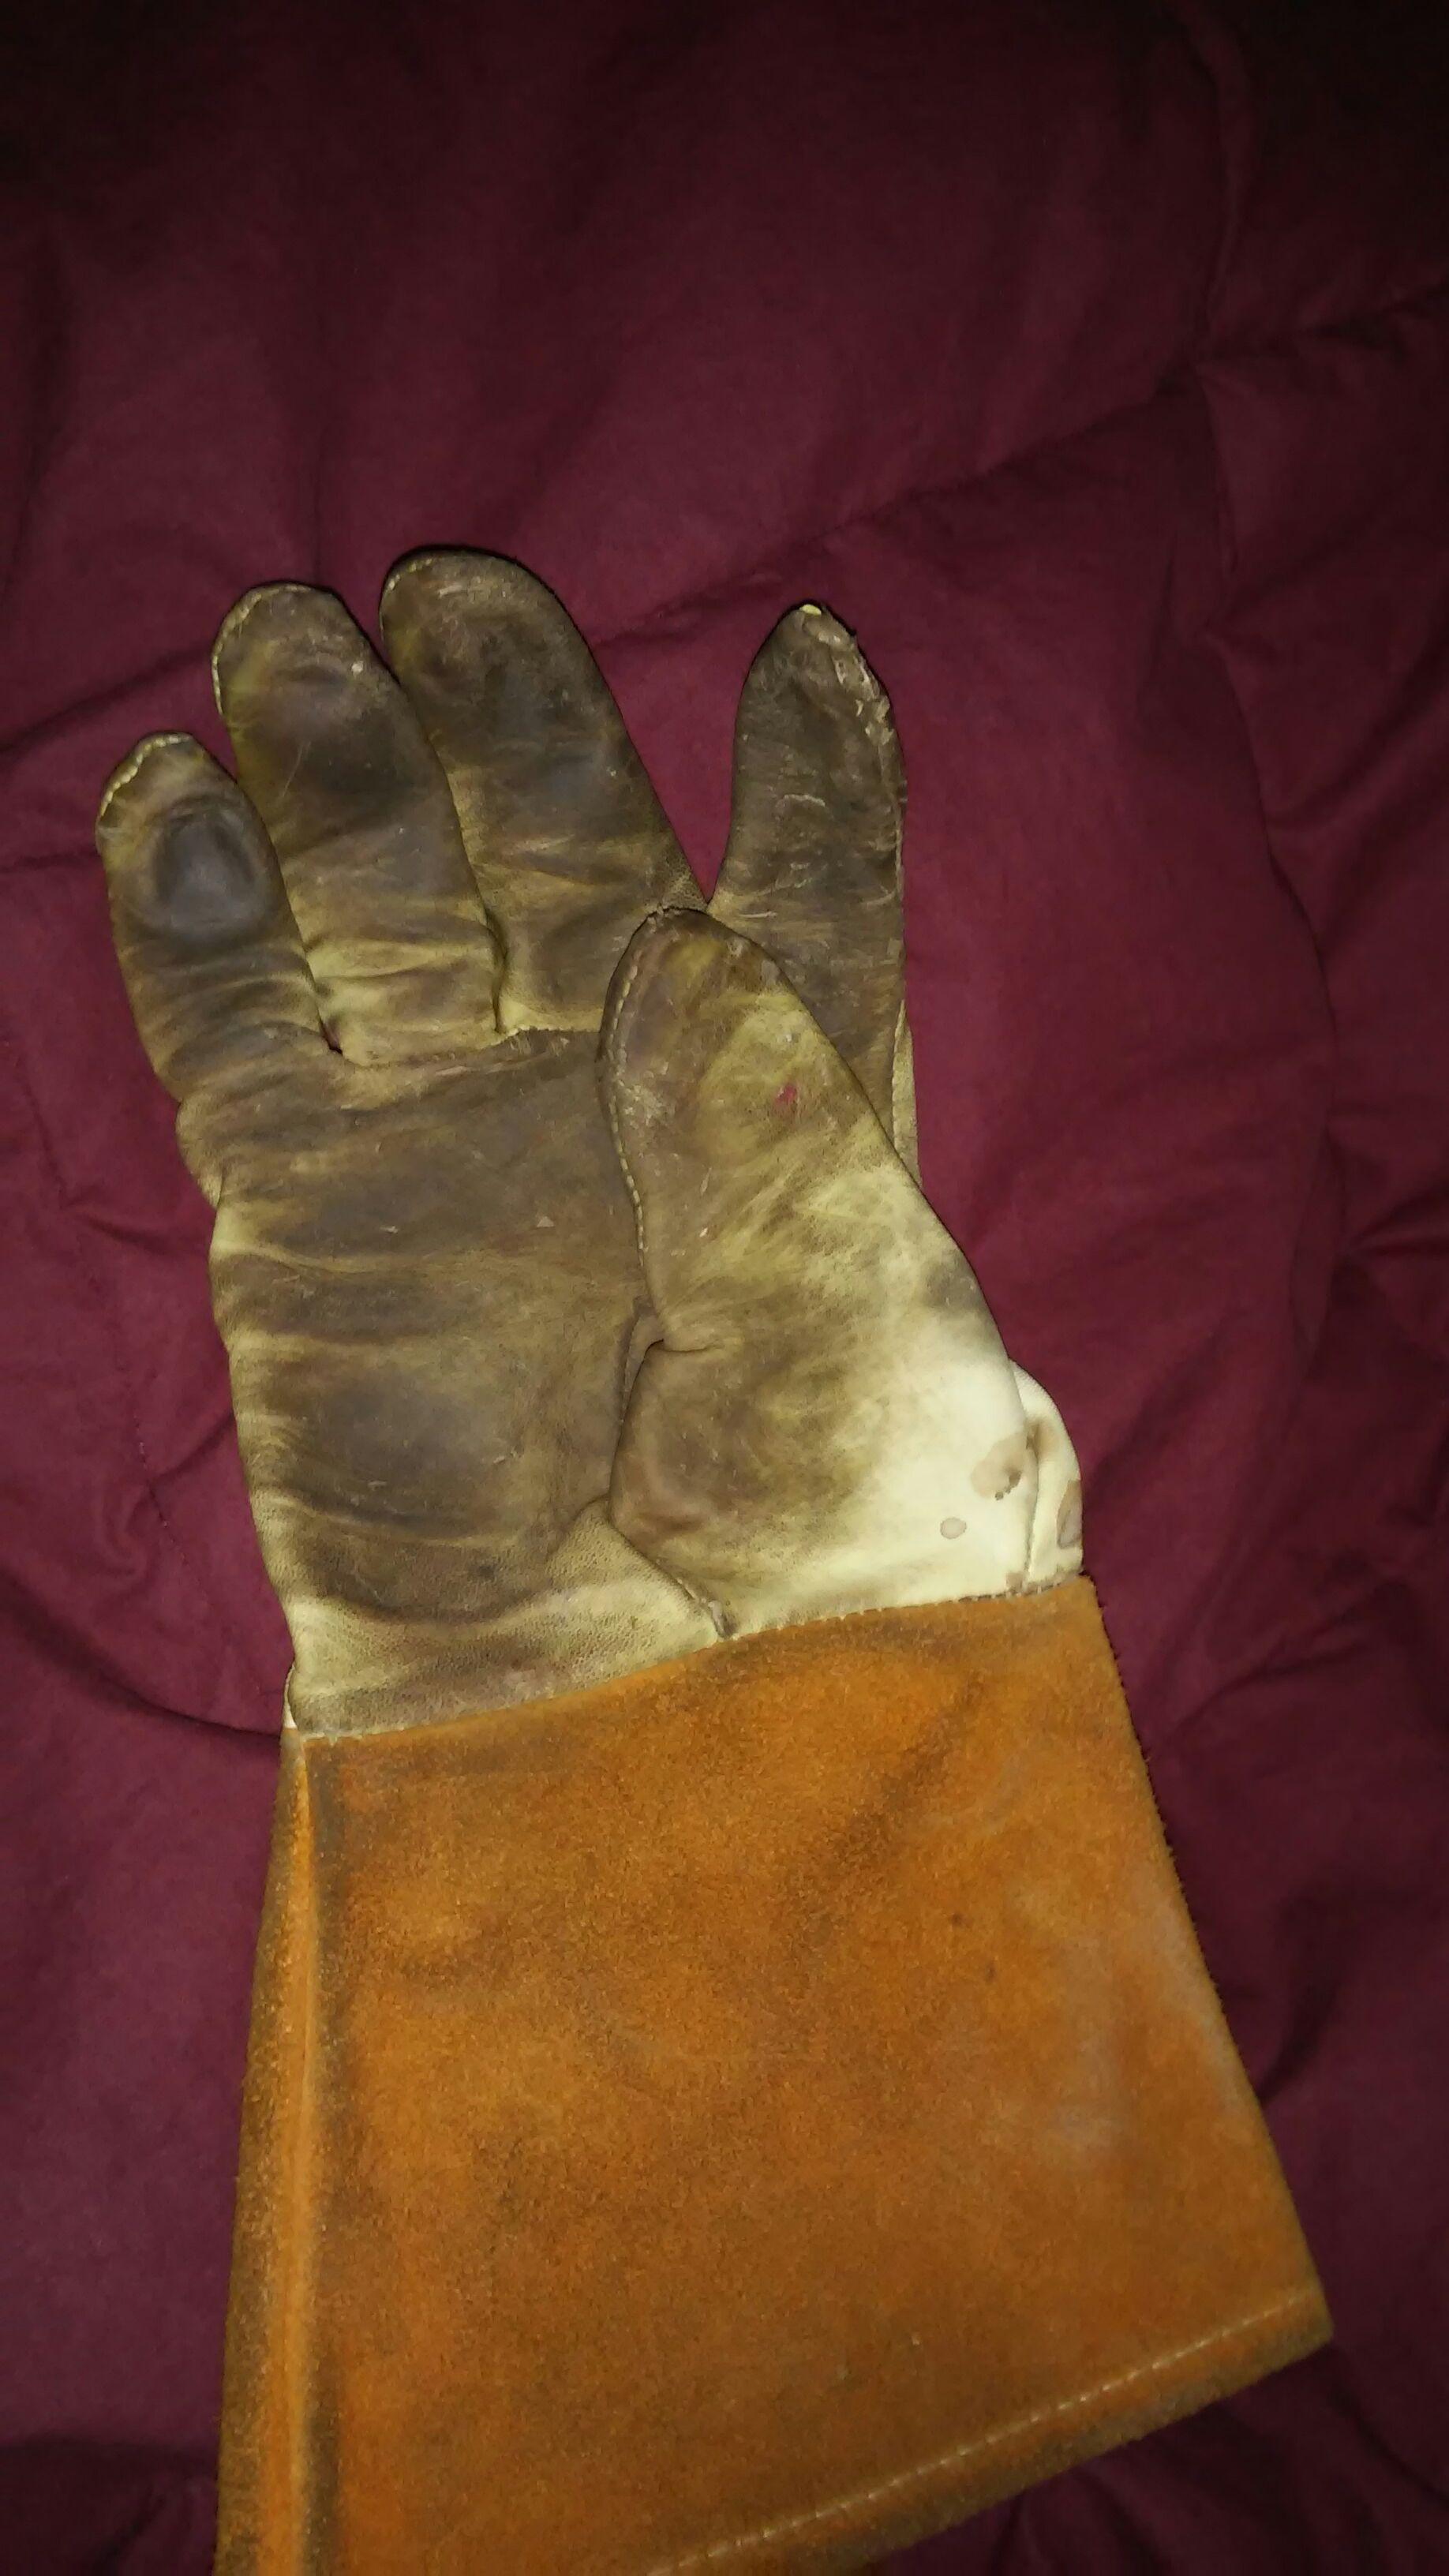 Welding Gloves That Live Forever